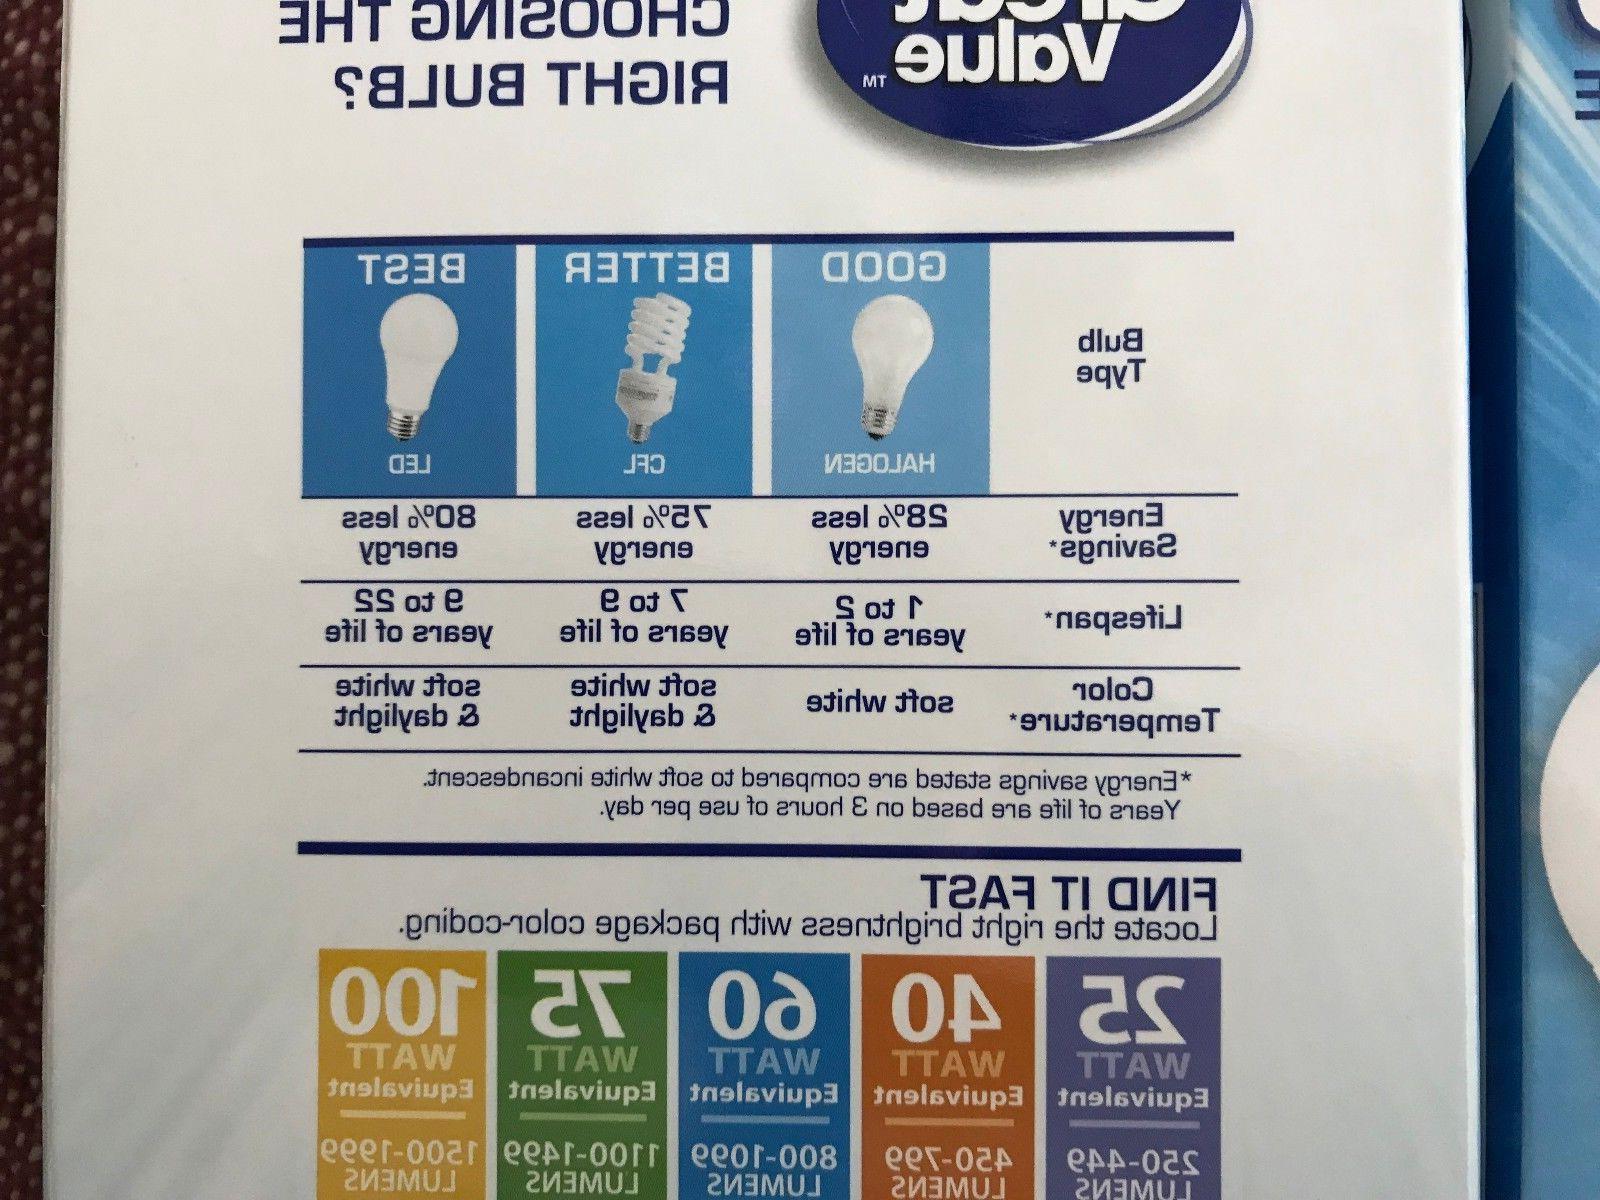 12 = Watt Equivalent A19 E26 bulb